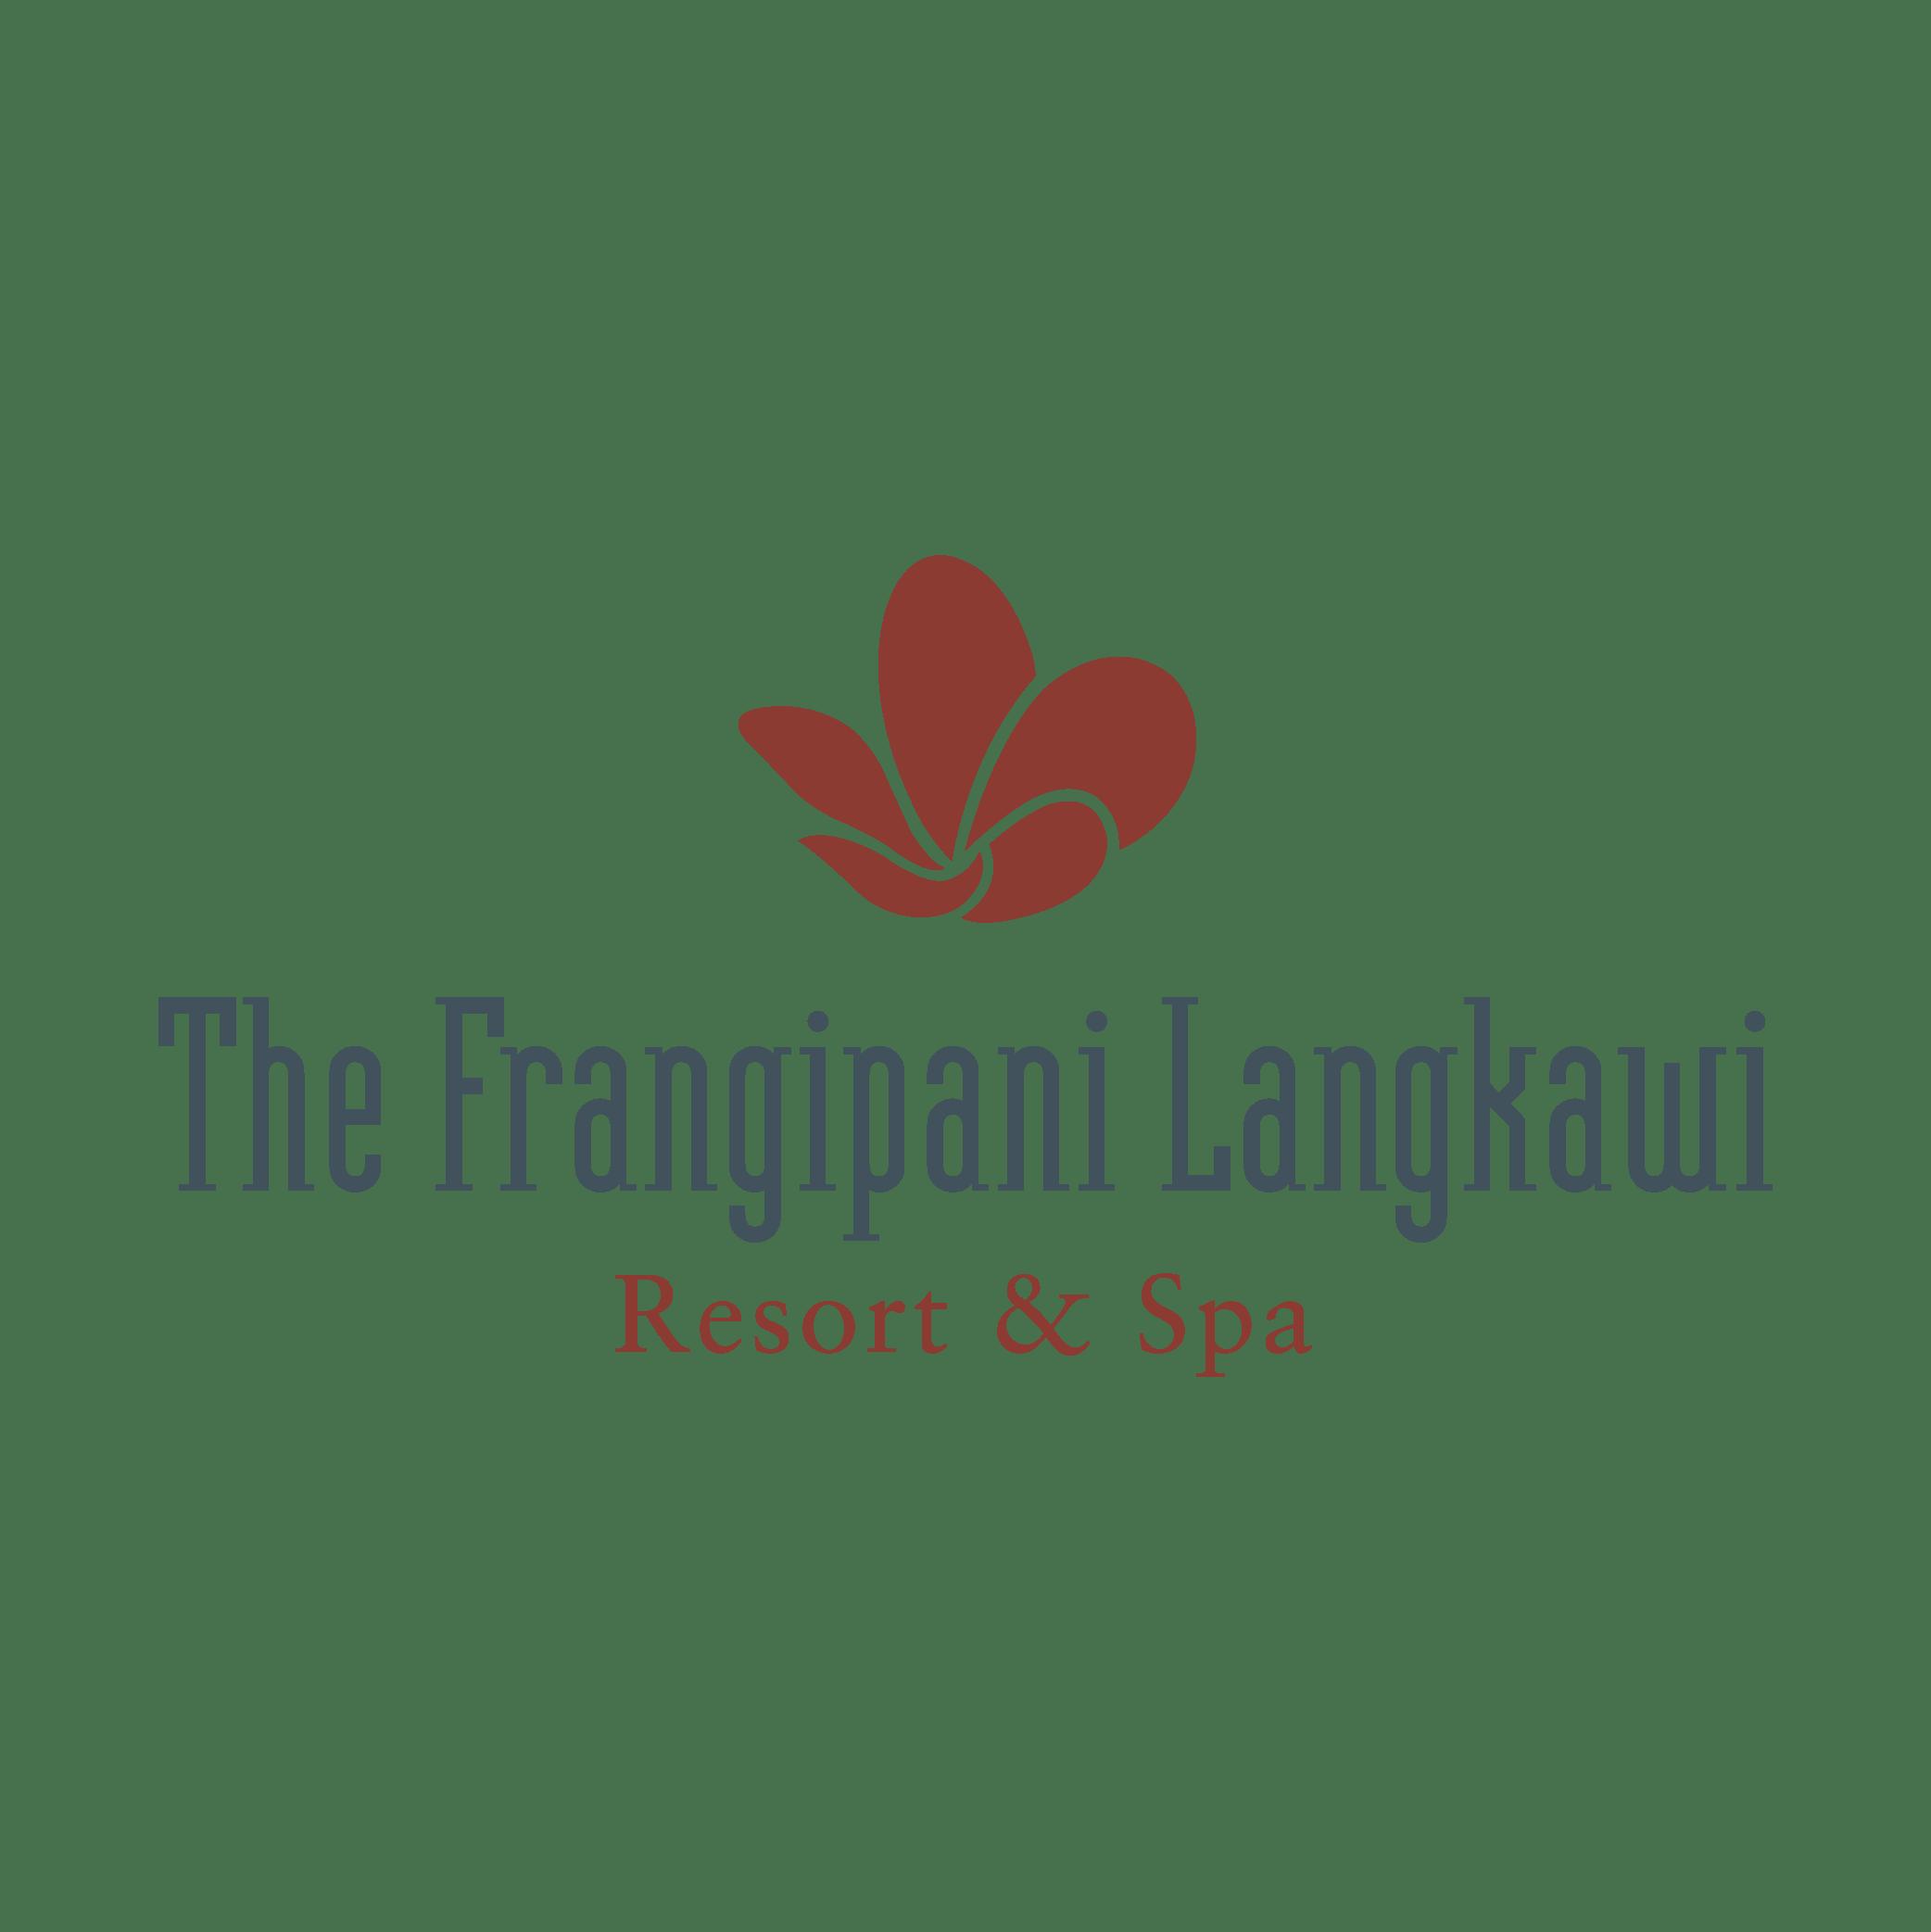 200219_ logo for website_Frangipani Langkawi